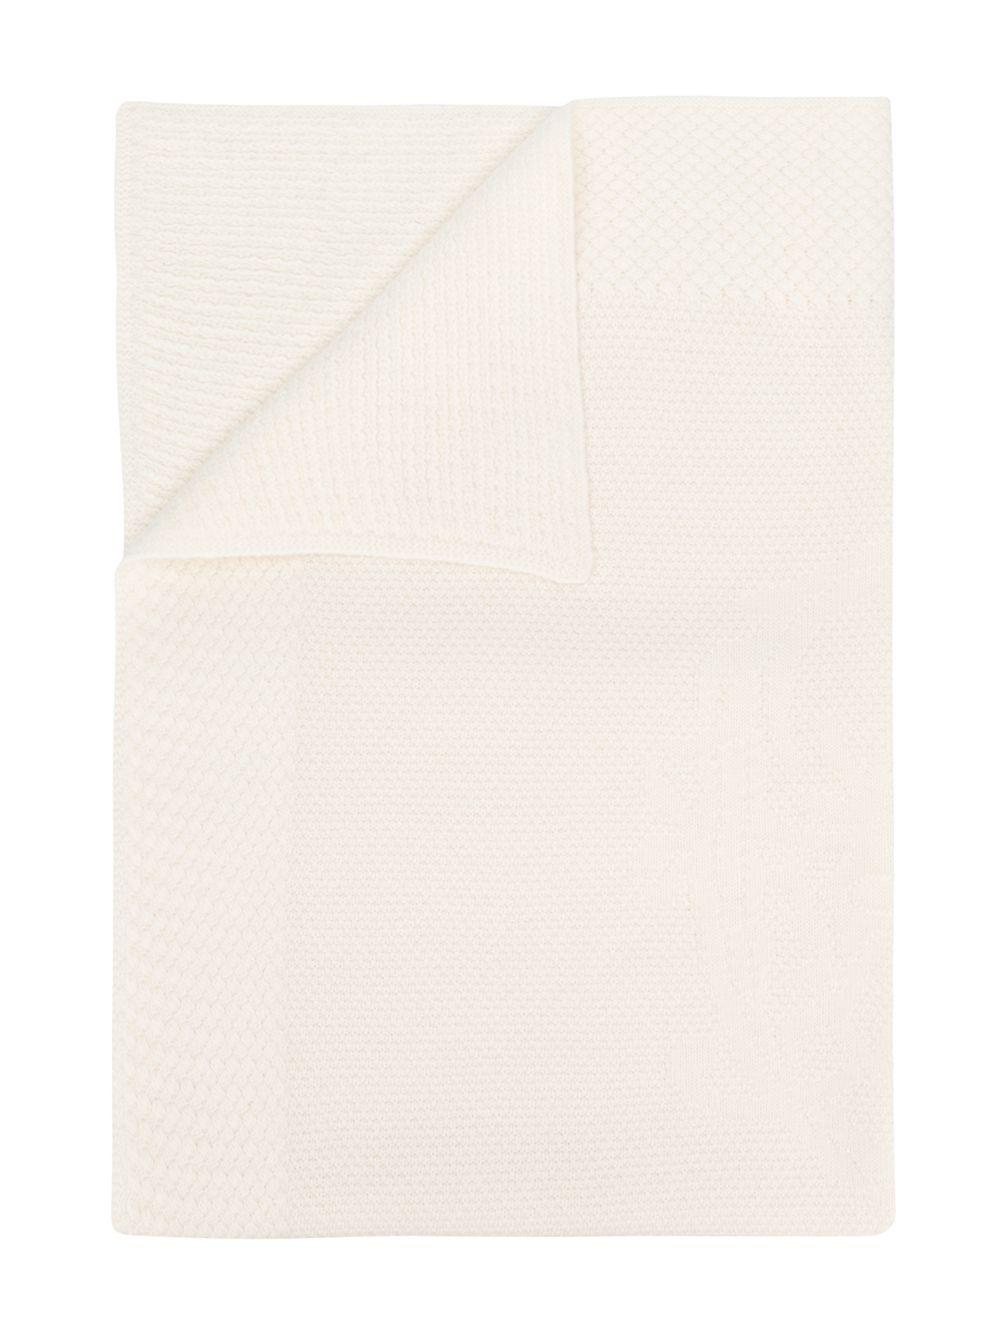 Chloé Kids | трикотажное одеяло | Clouty